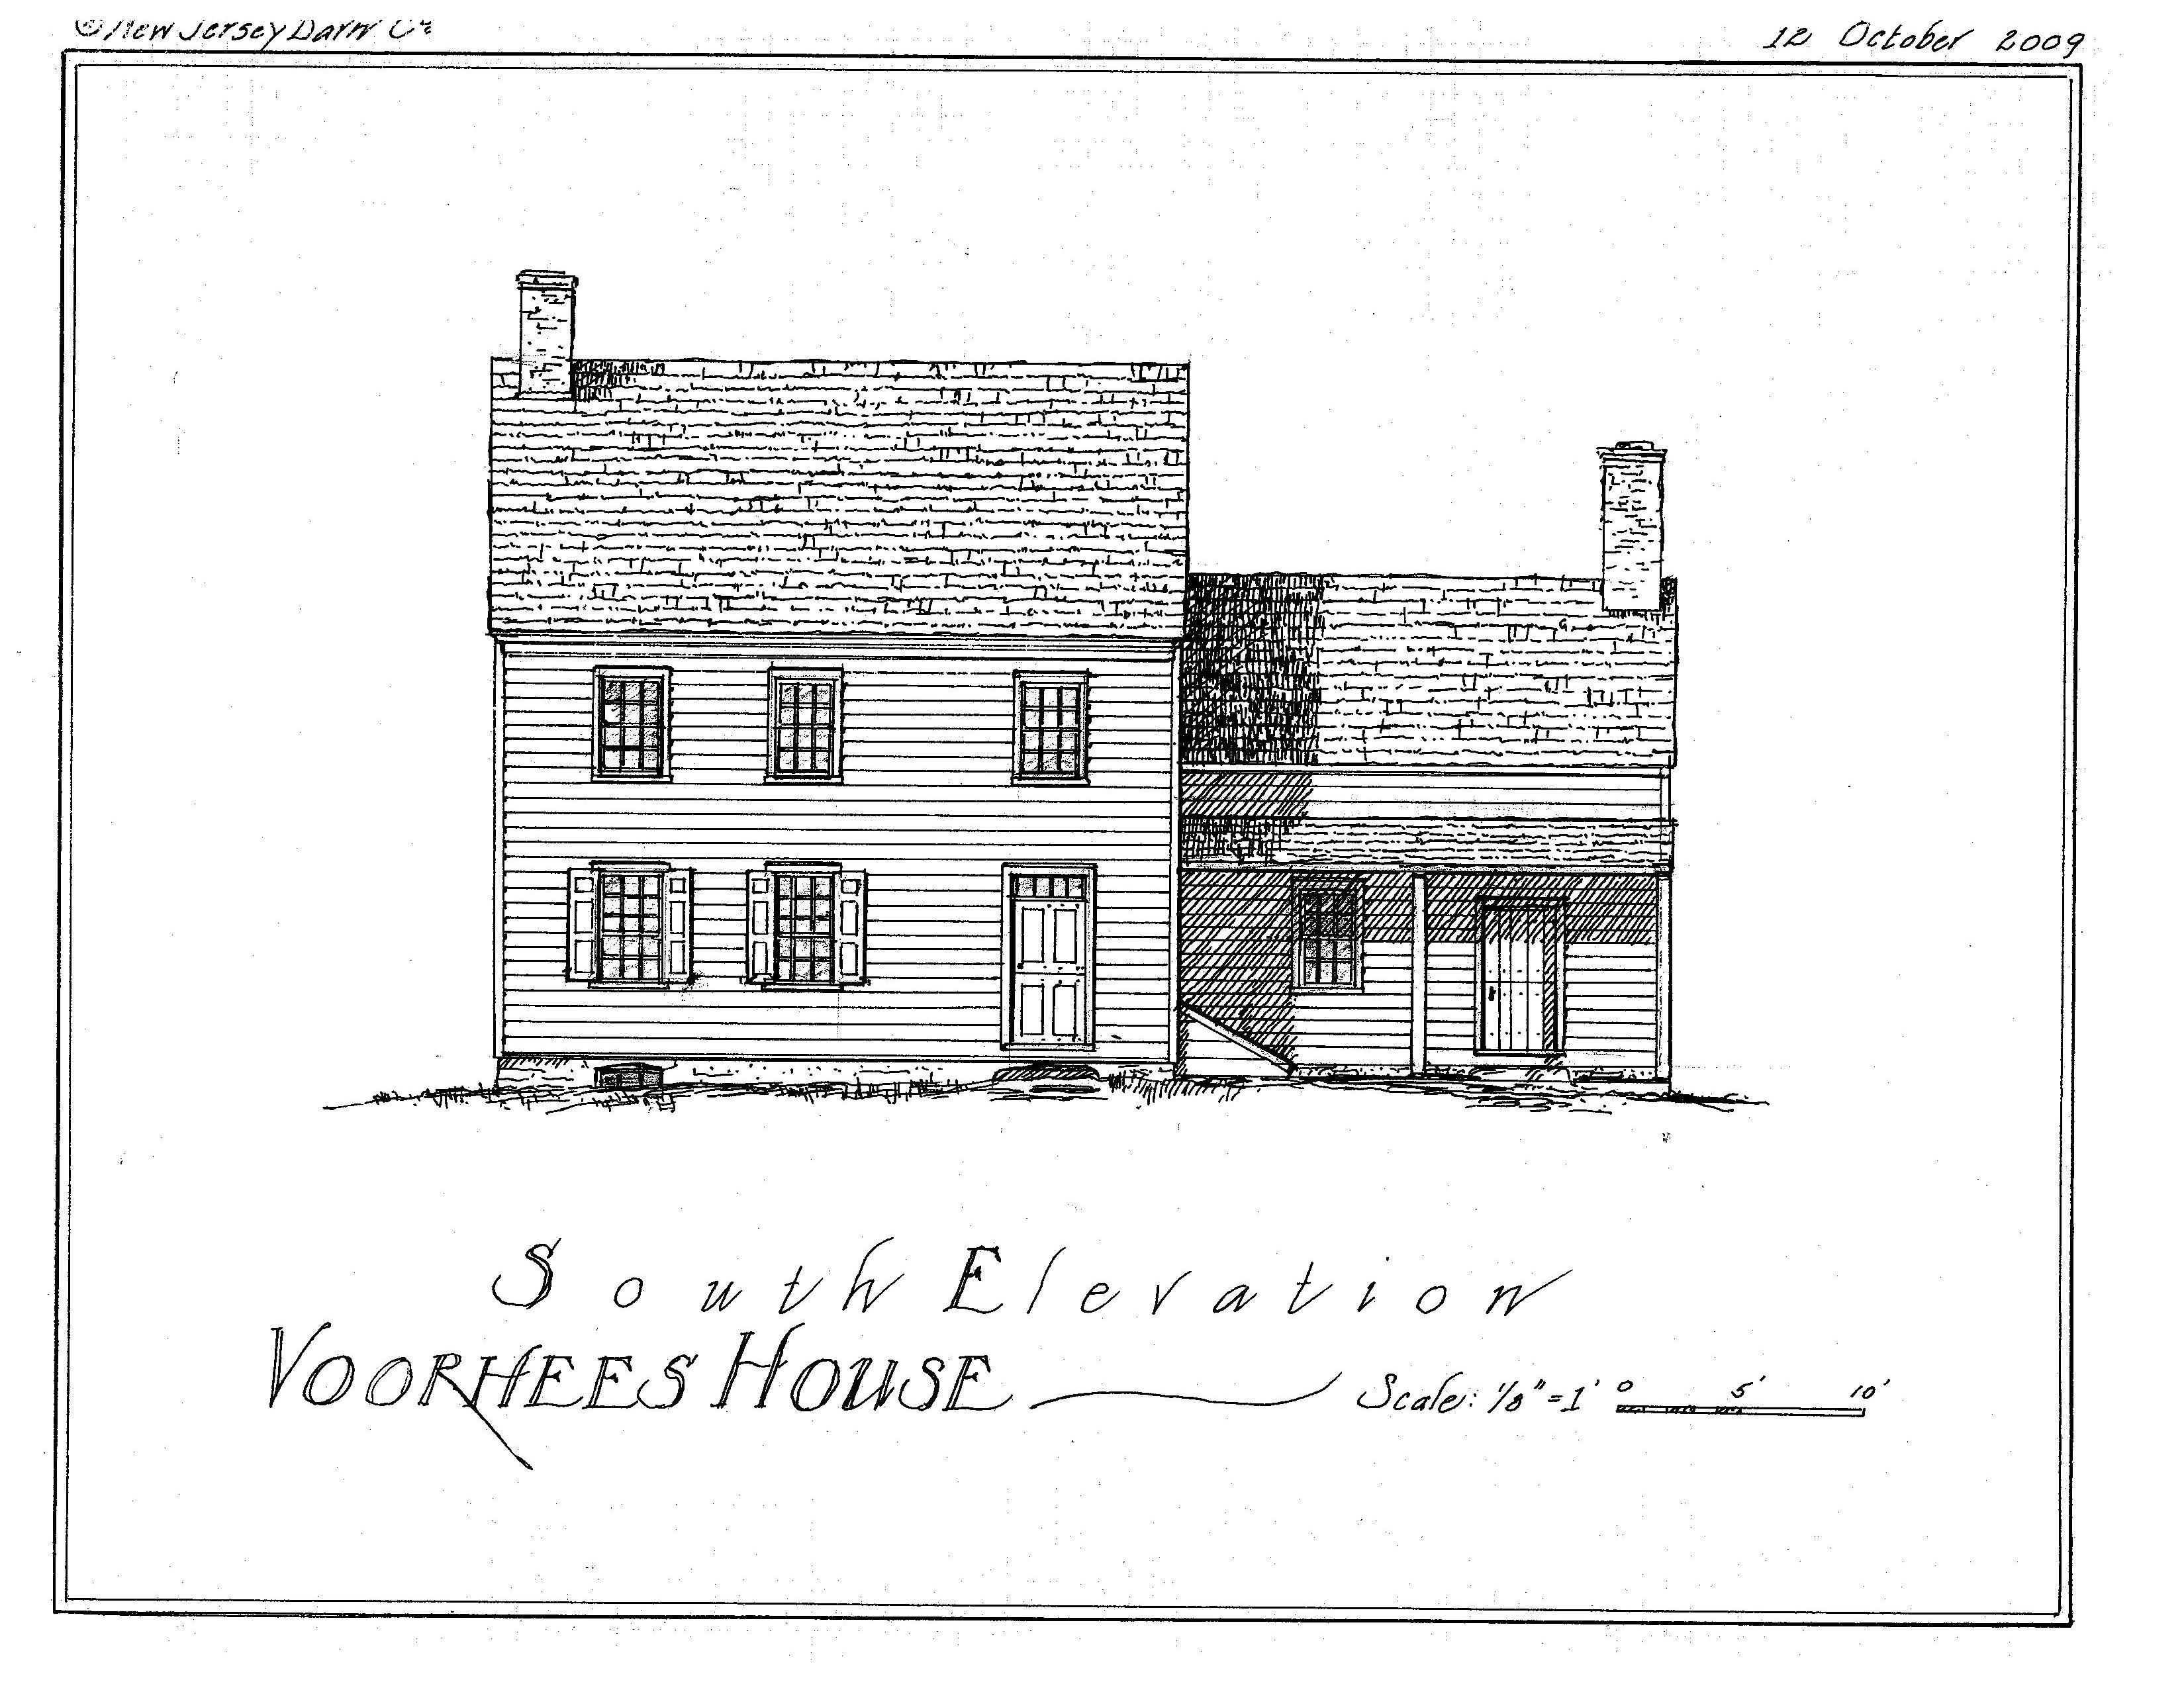 Vorhees House - 1790